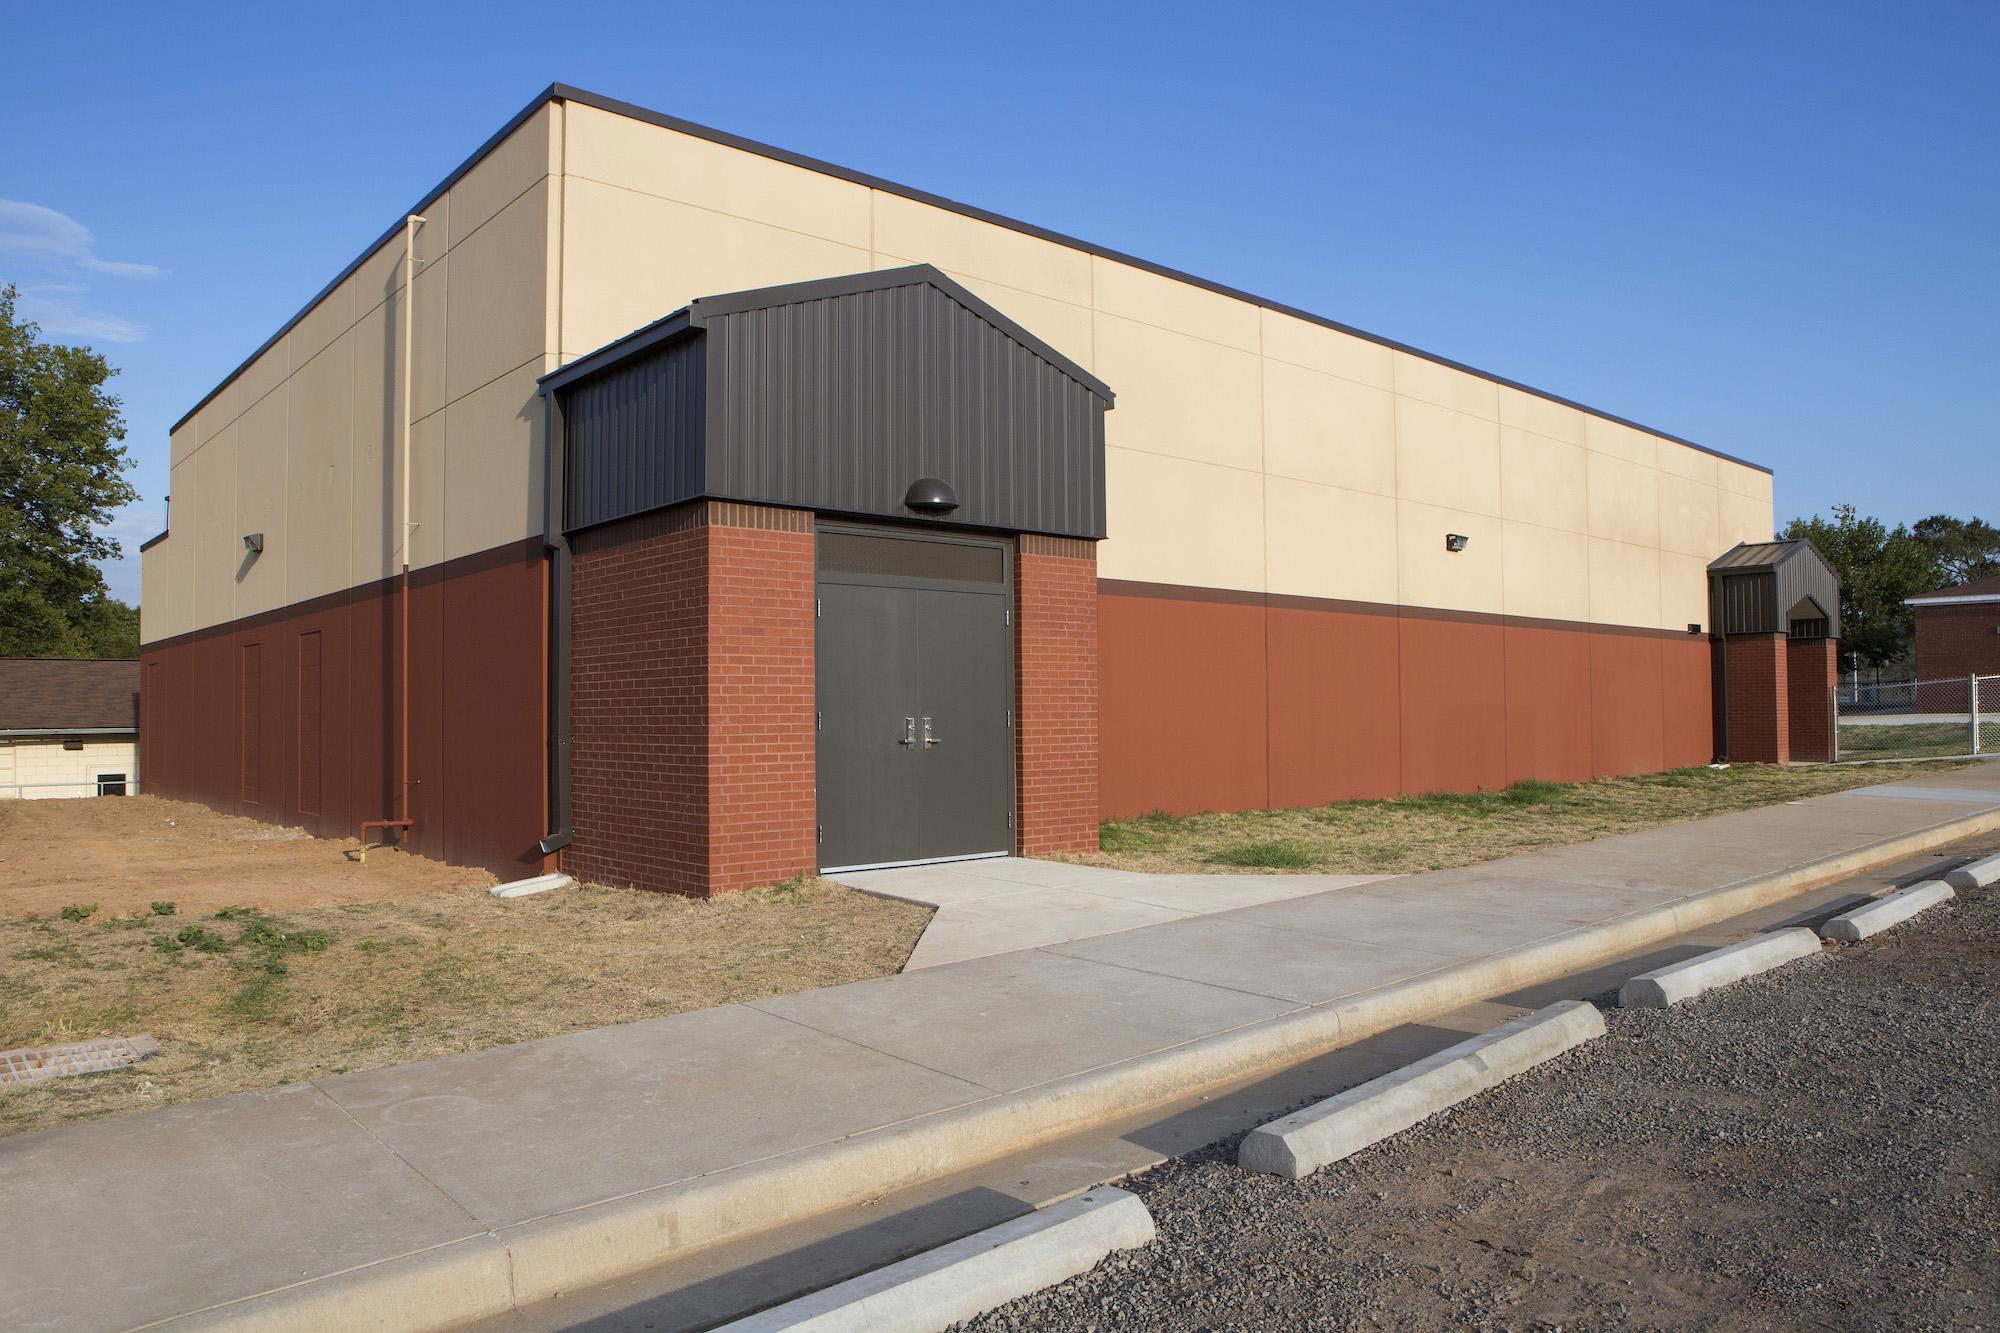 Cedarville El Saferoom 2